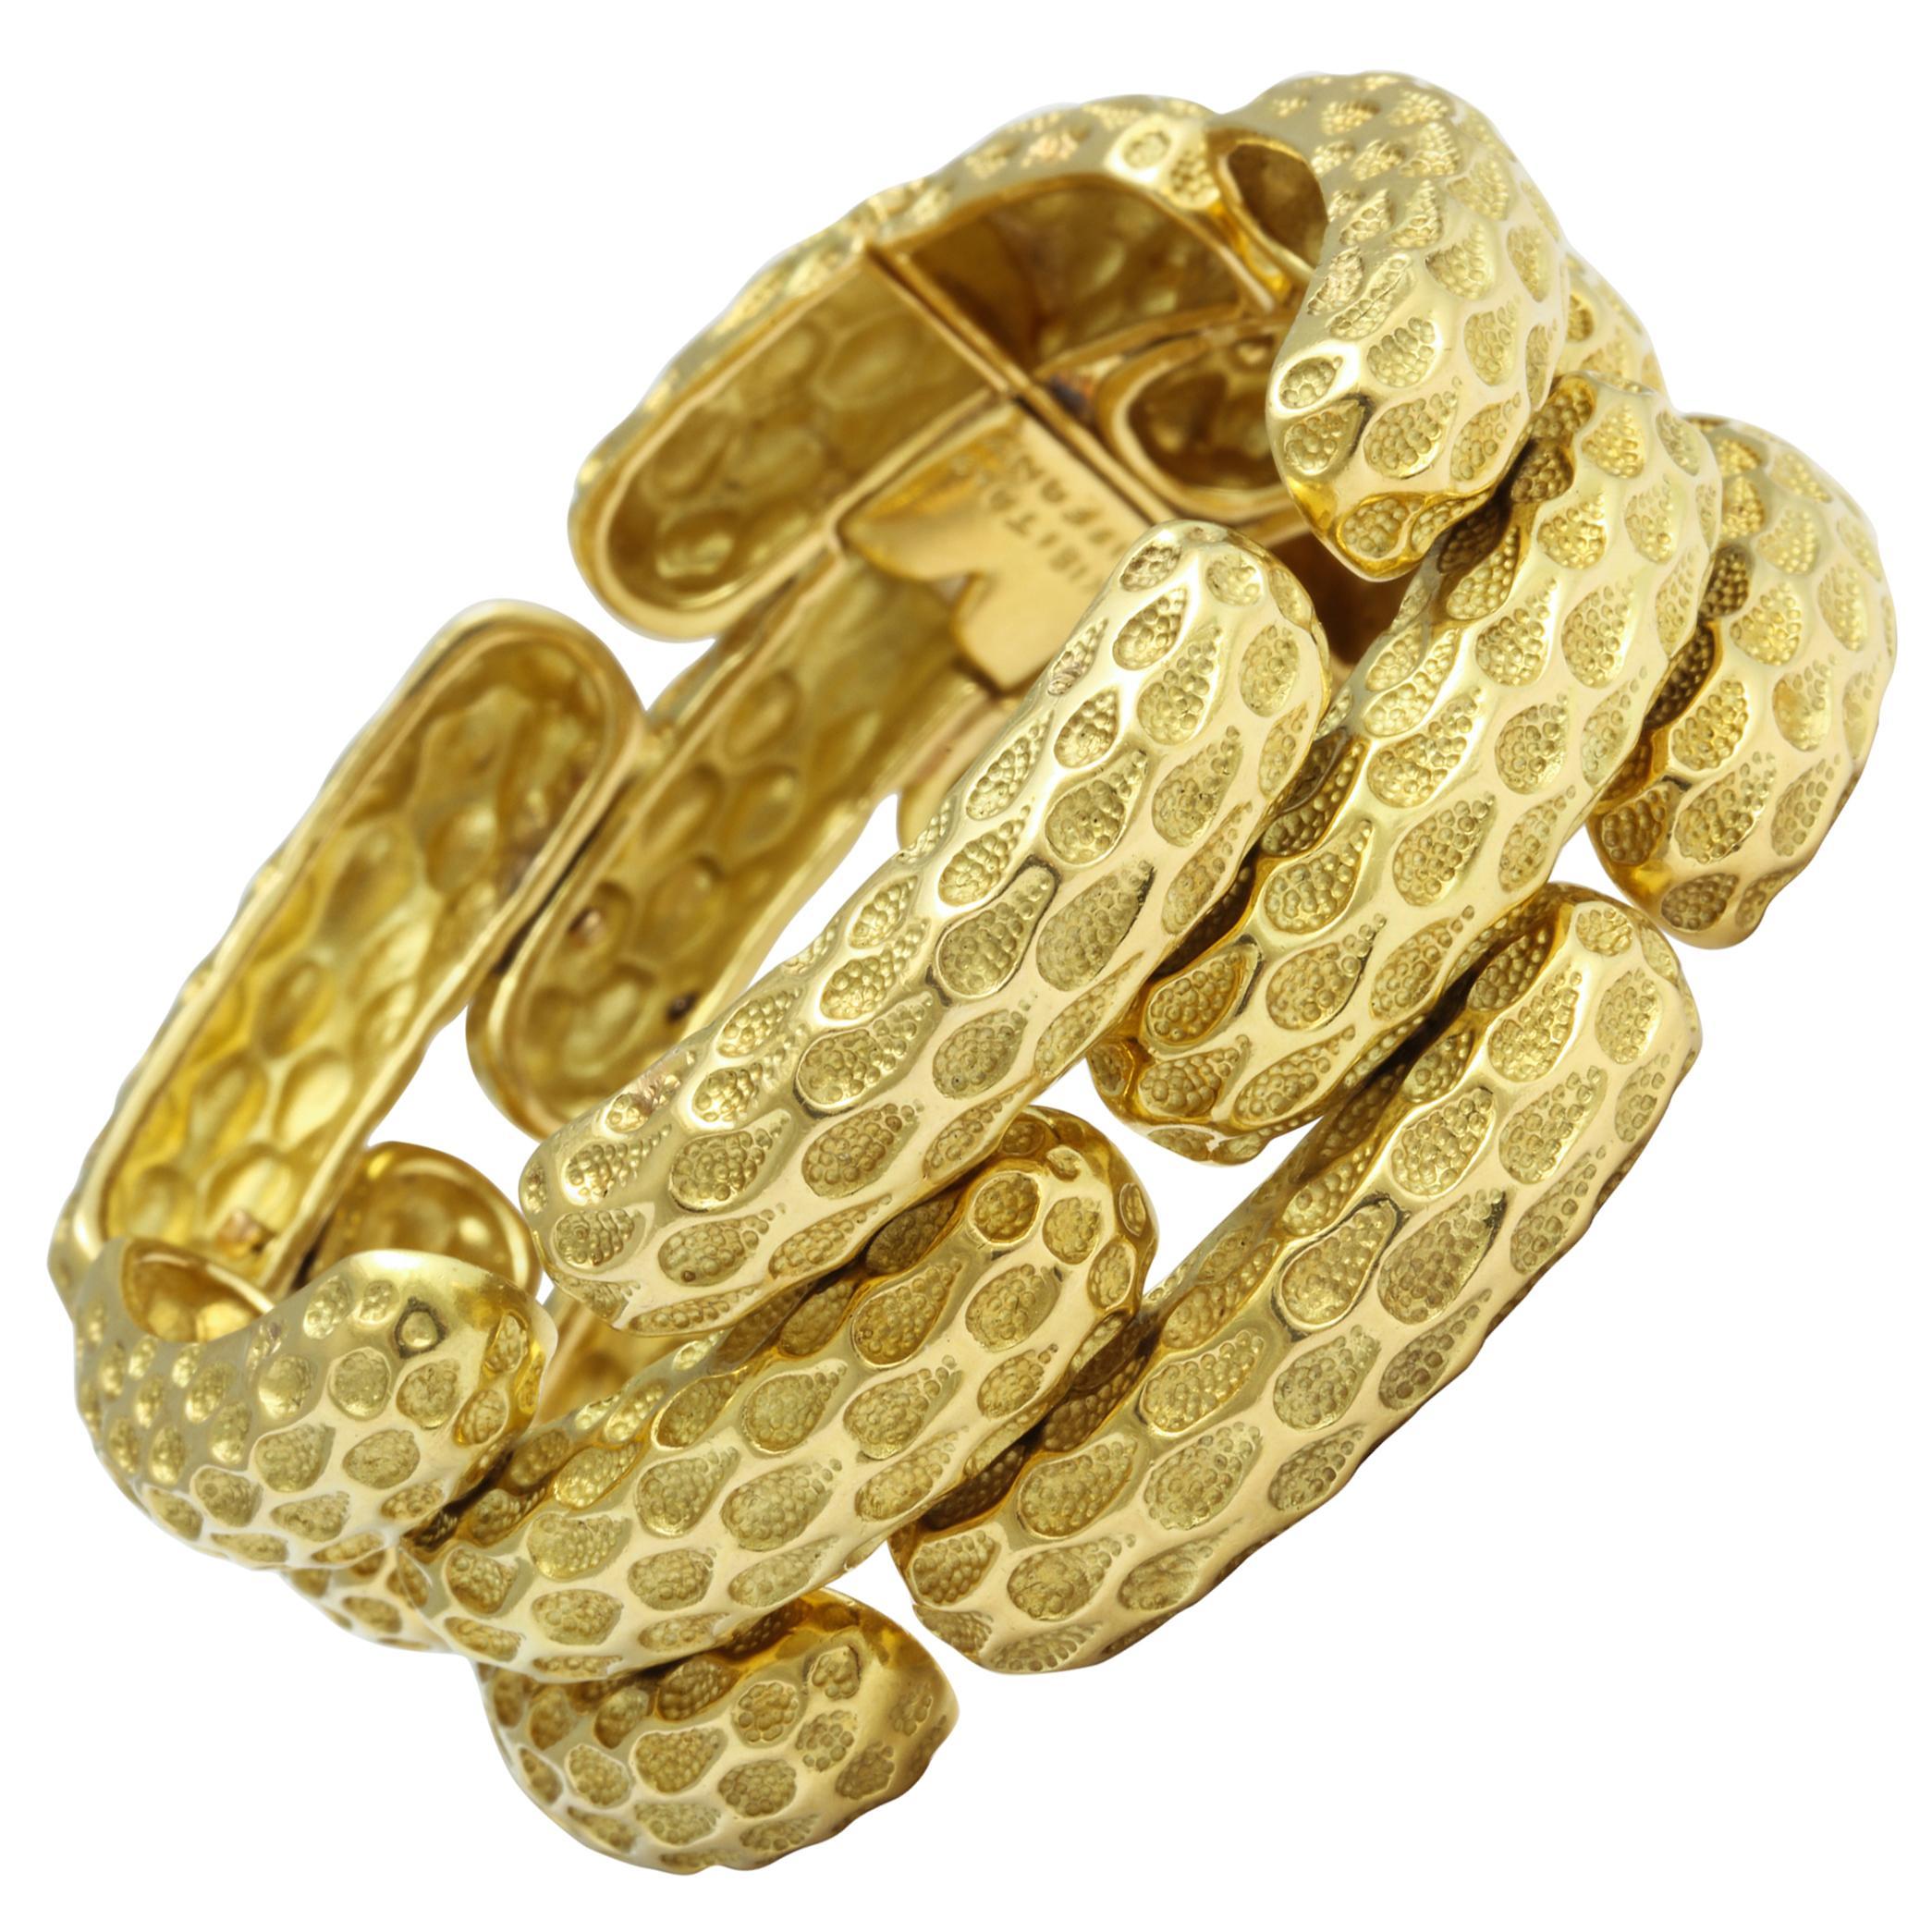 Tiffany & Co. Wide Gold Link Bracelet